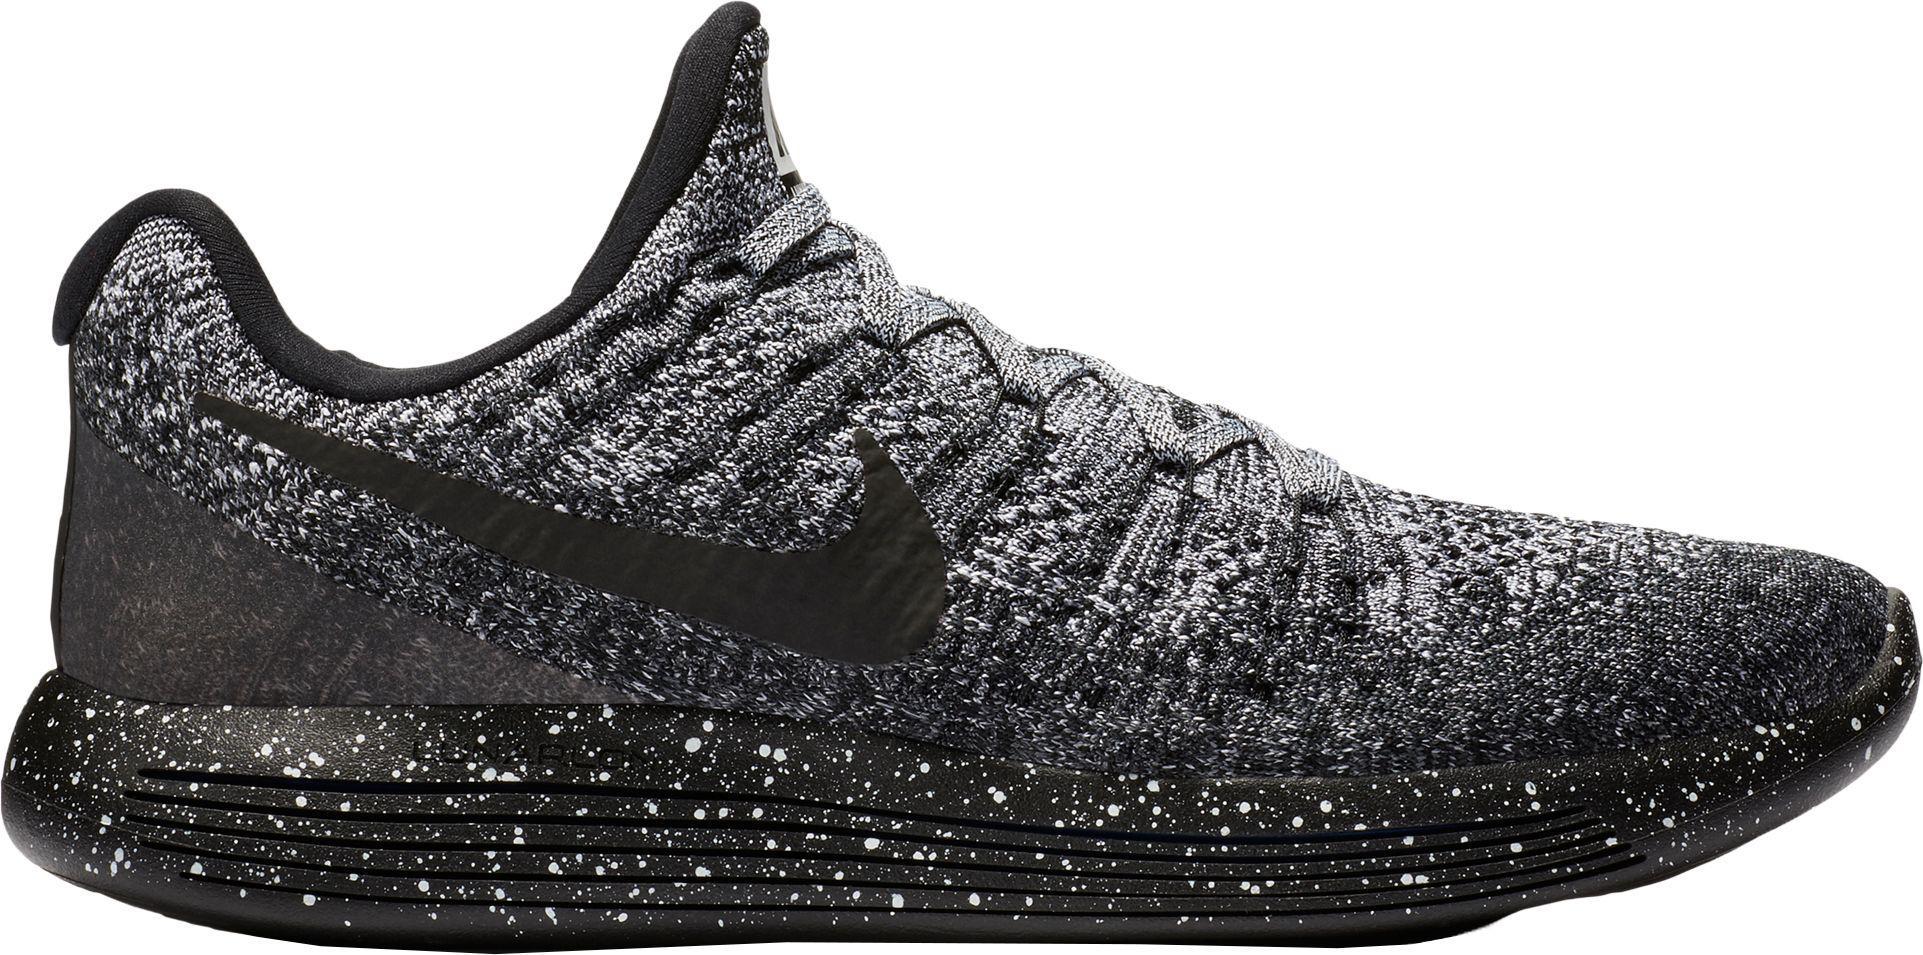 brand new 428ab 5e8f5 Men's Black Lunarepic Low Flyknit 2 Running Shoes